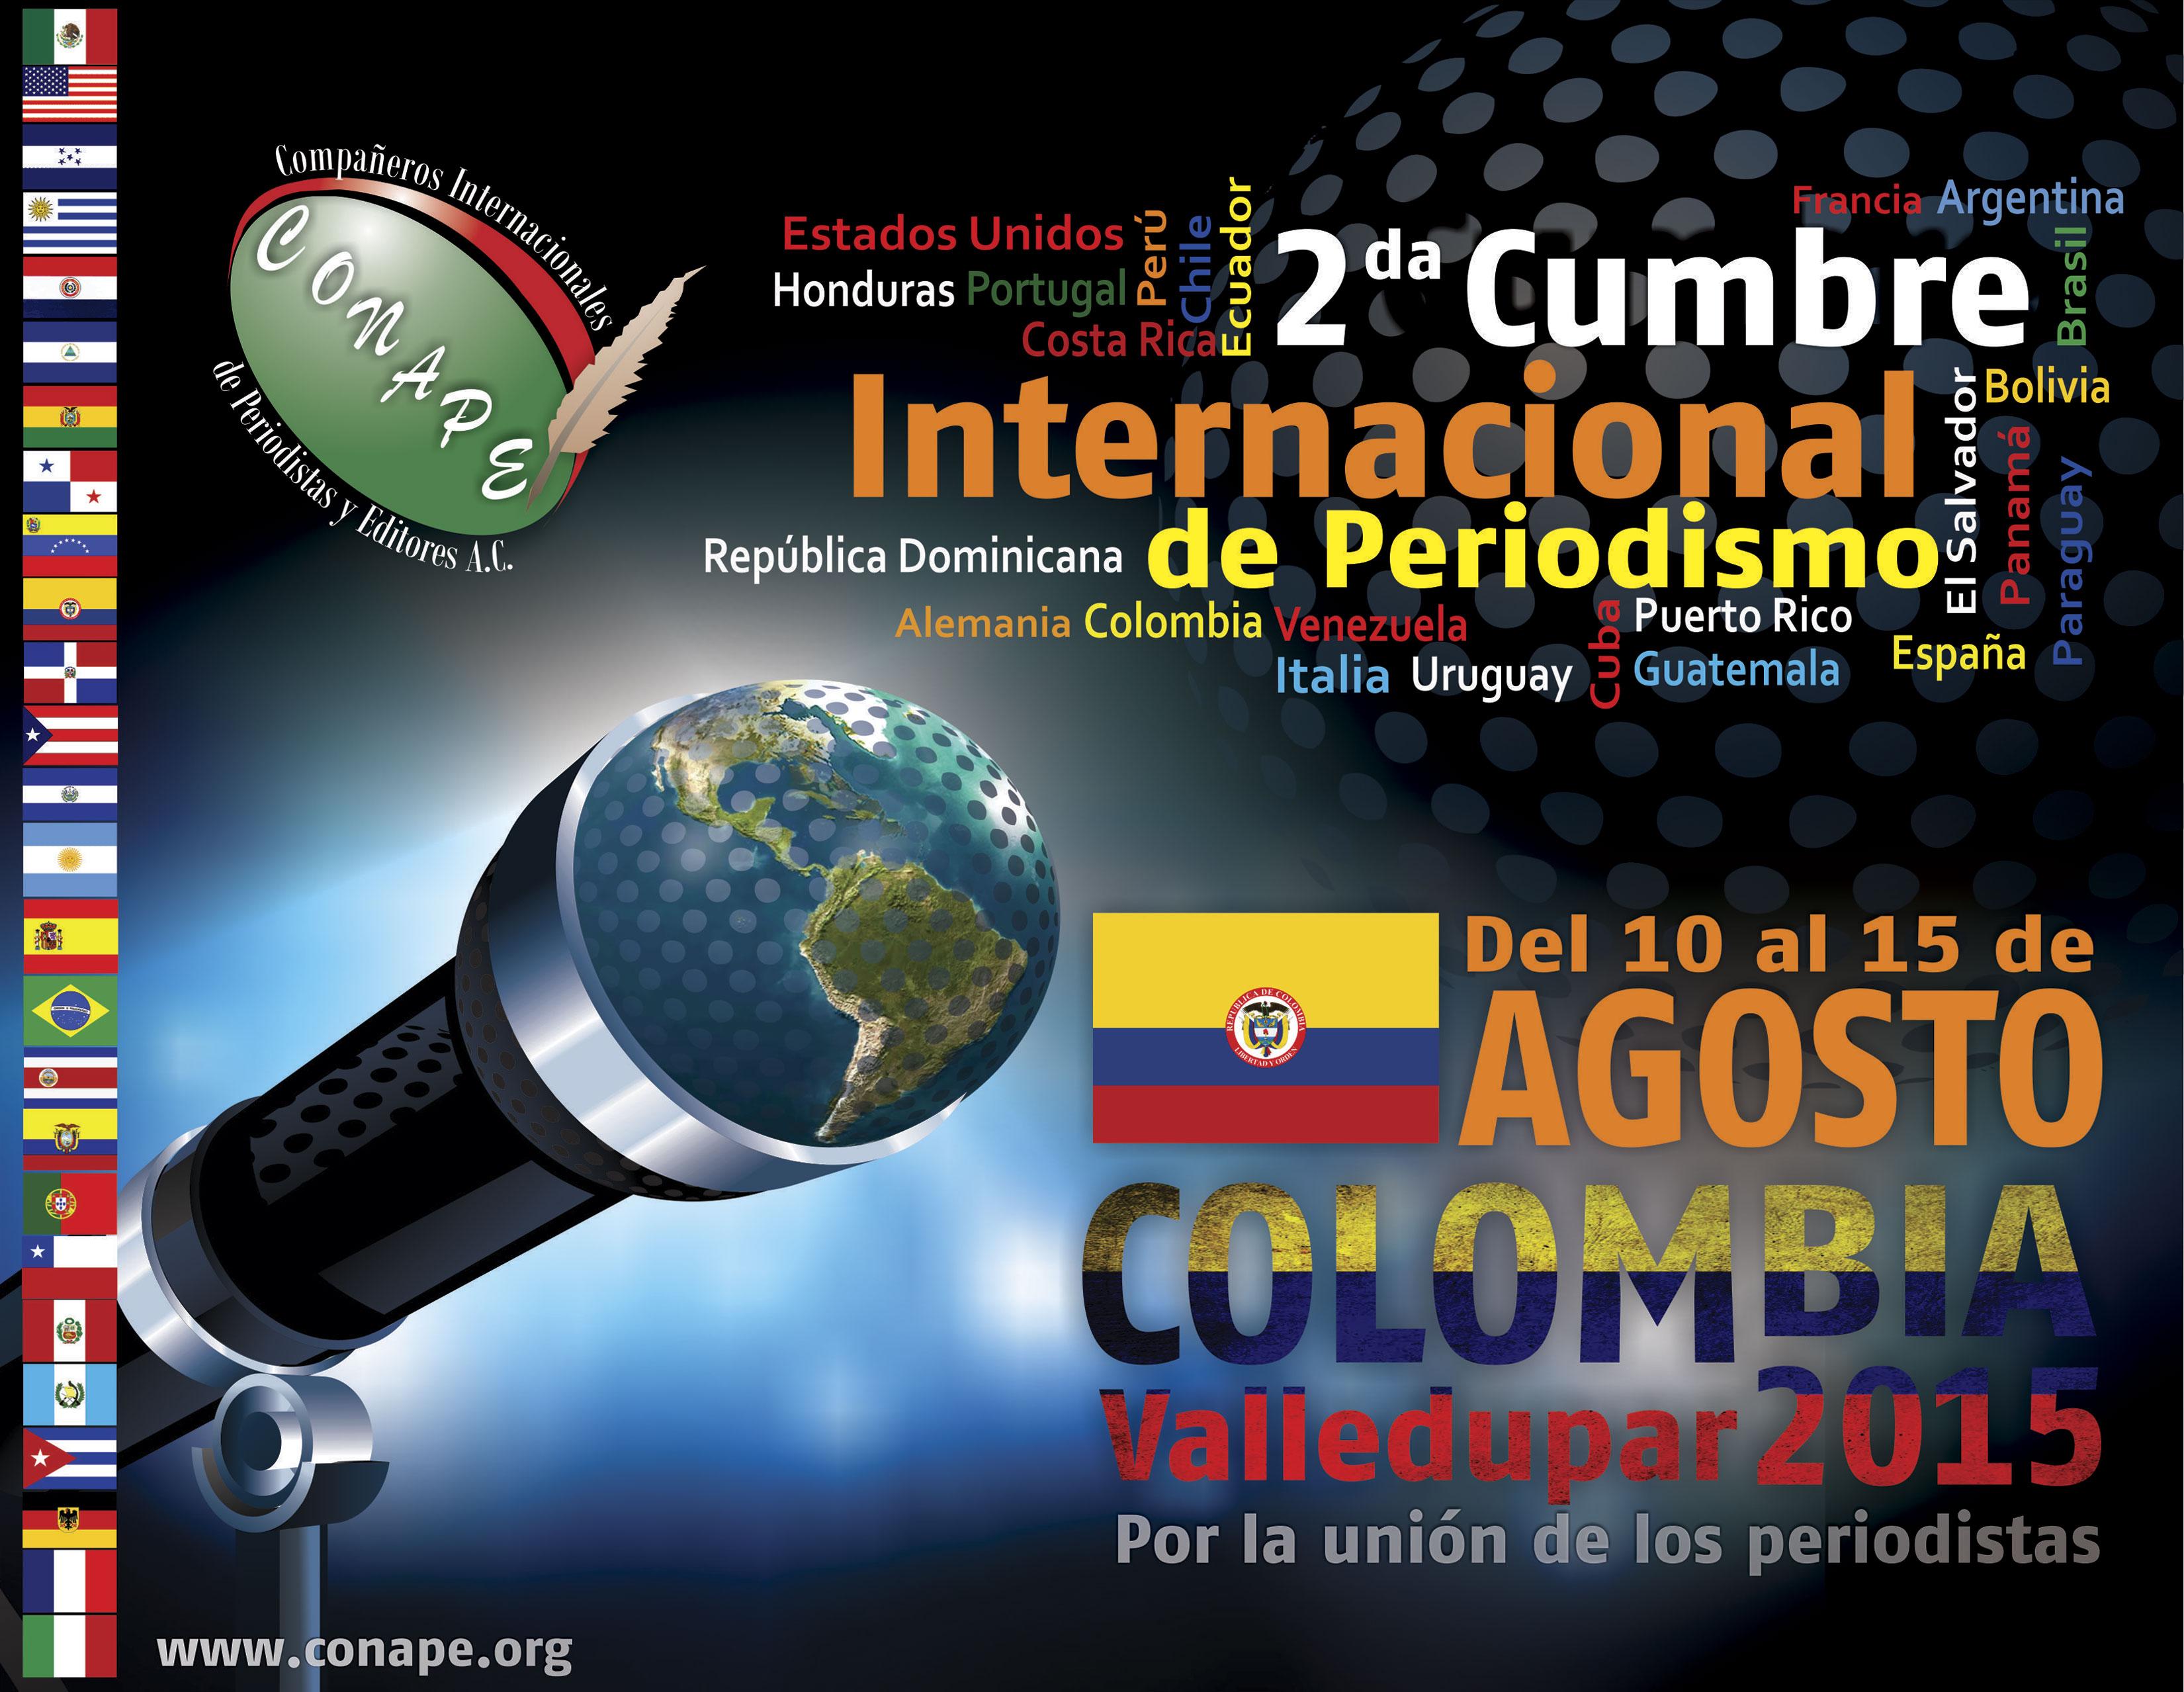 SEGUNDA CUMBRE INTERNACIONAL DE PERIODISMO - COLOMBIA 2015